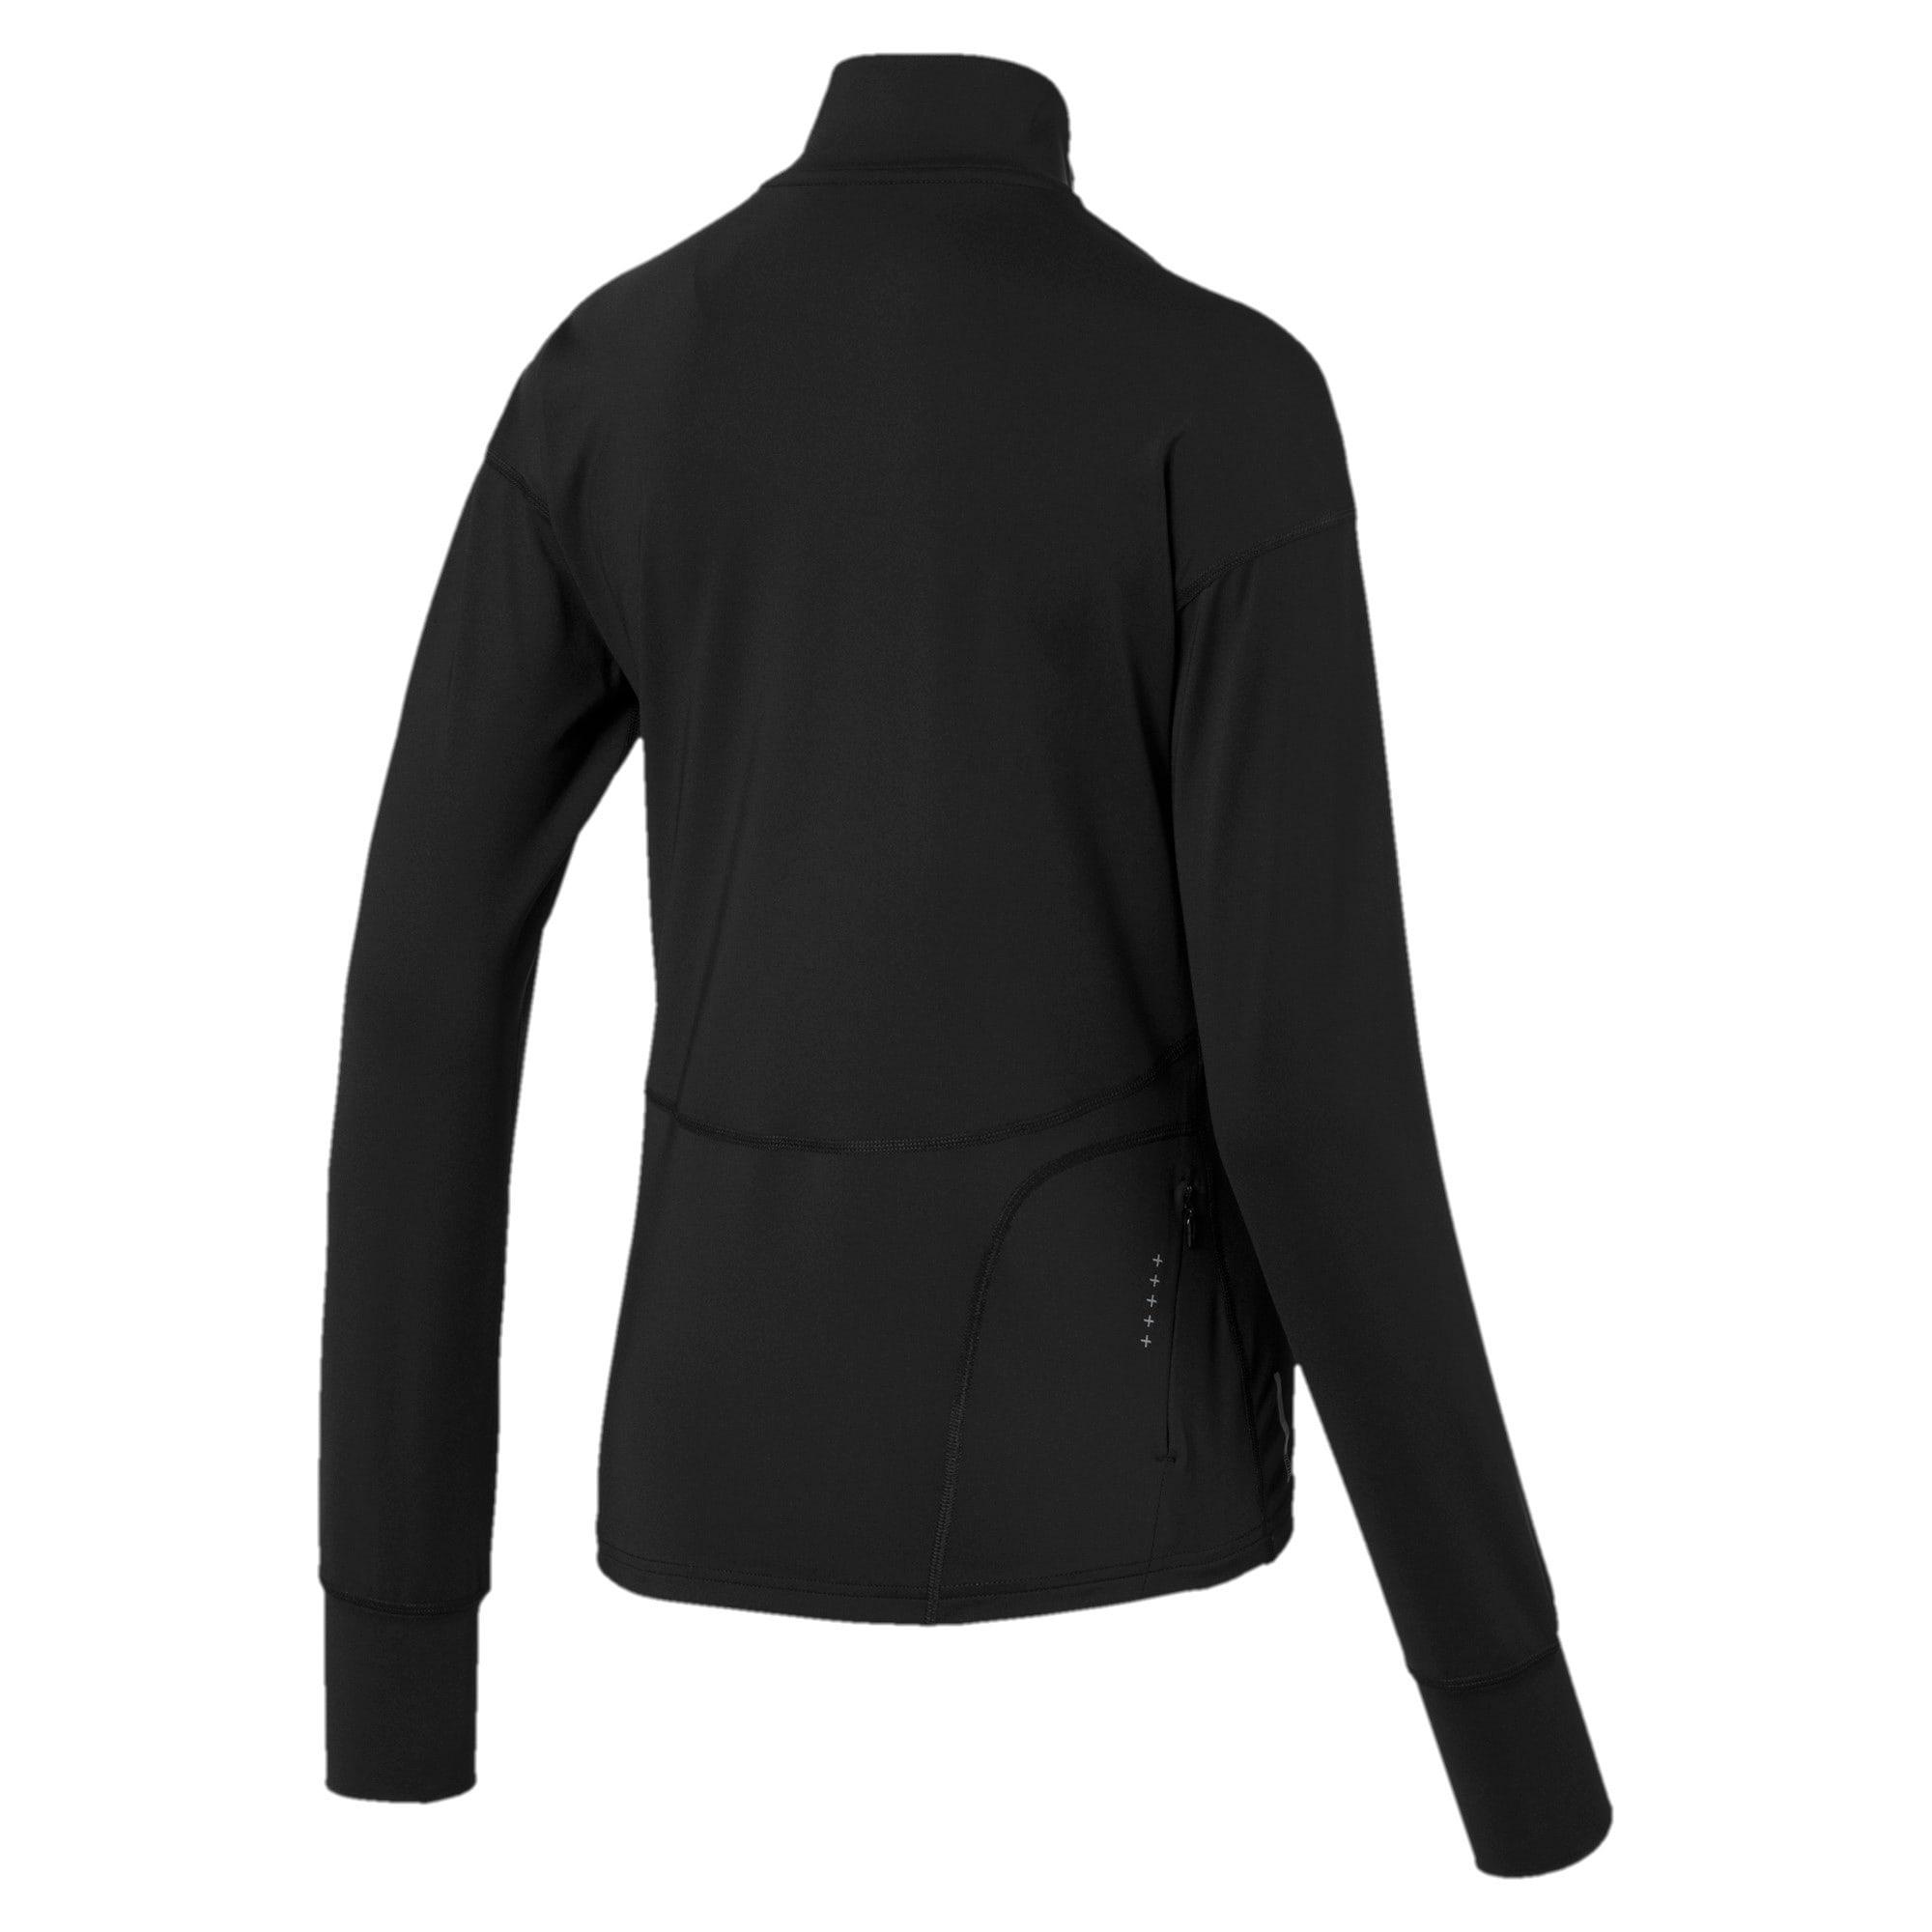 Thumbnail 5 of Ignite Long Sleeve Women's Running Pullover, Puma Black, medium